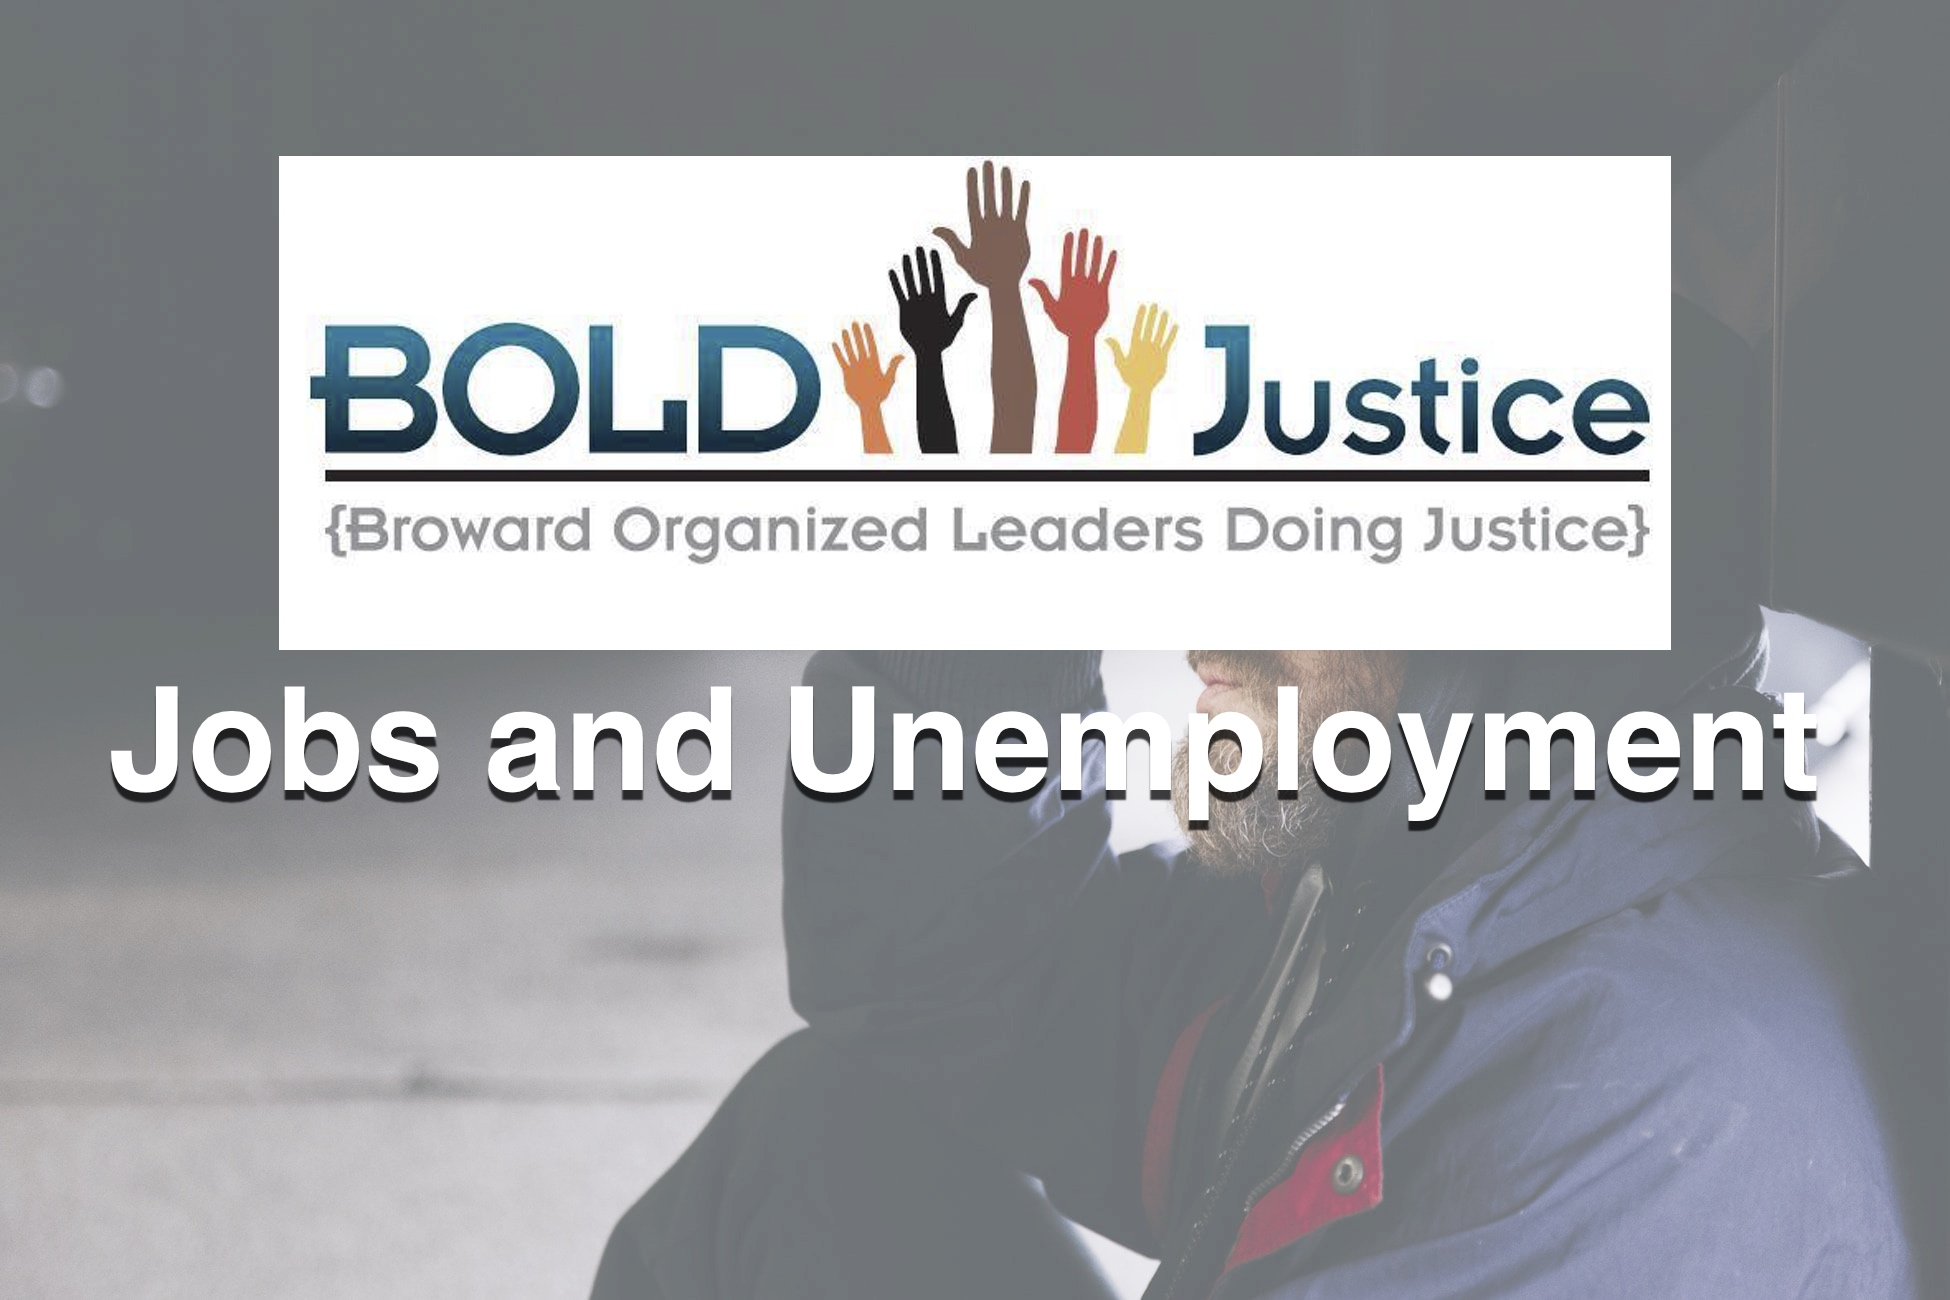 Jobs-and-Unemployment-1.jpg